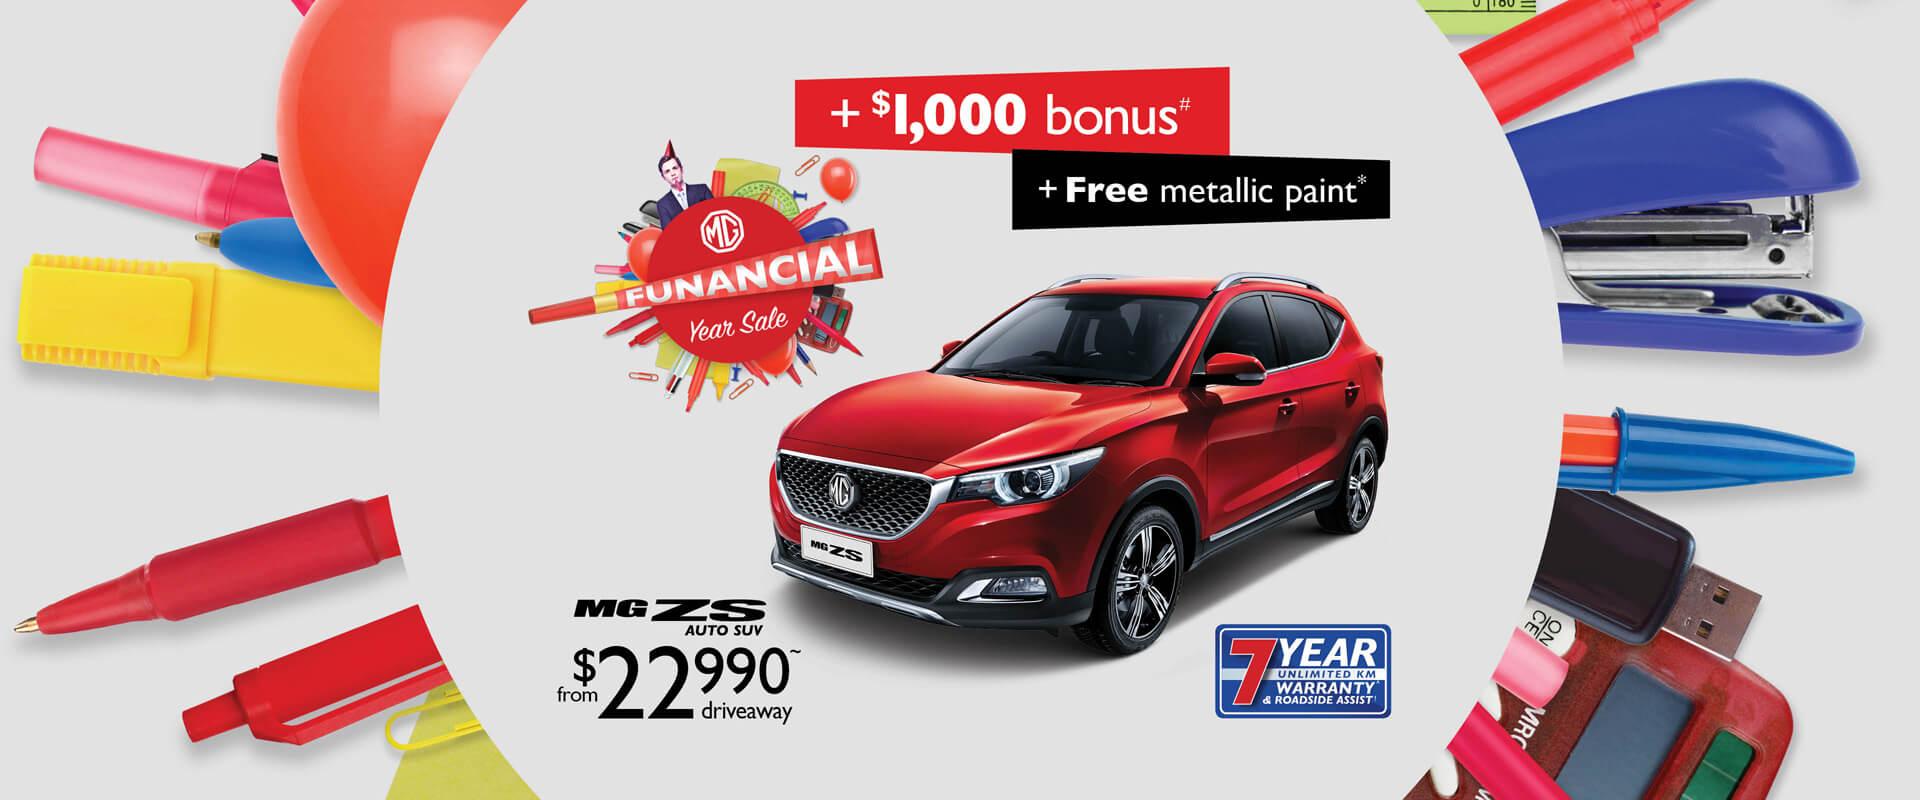 MG - Funancial Year Sale